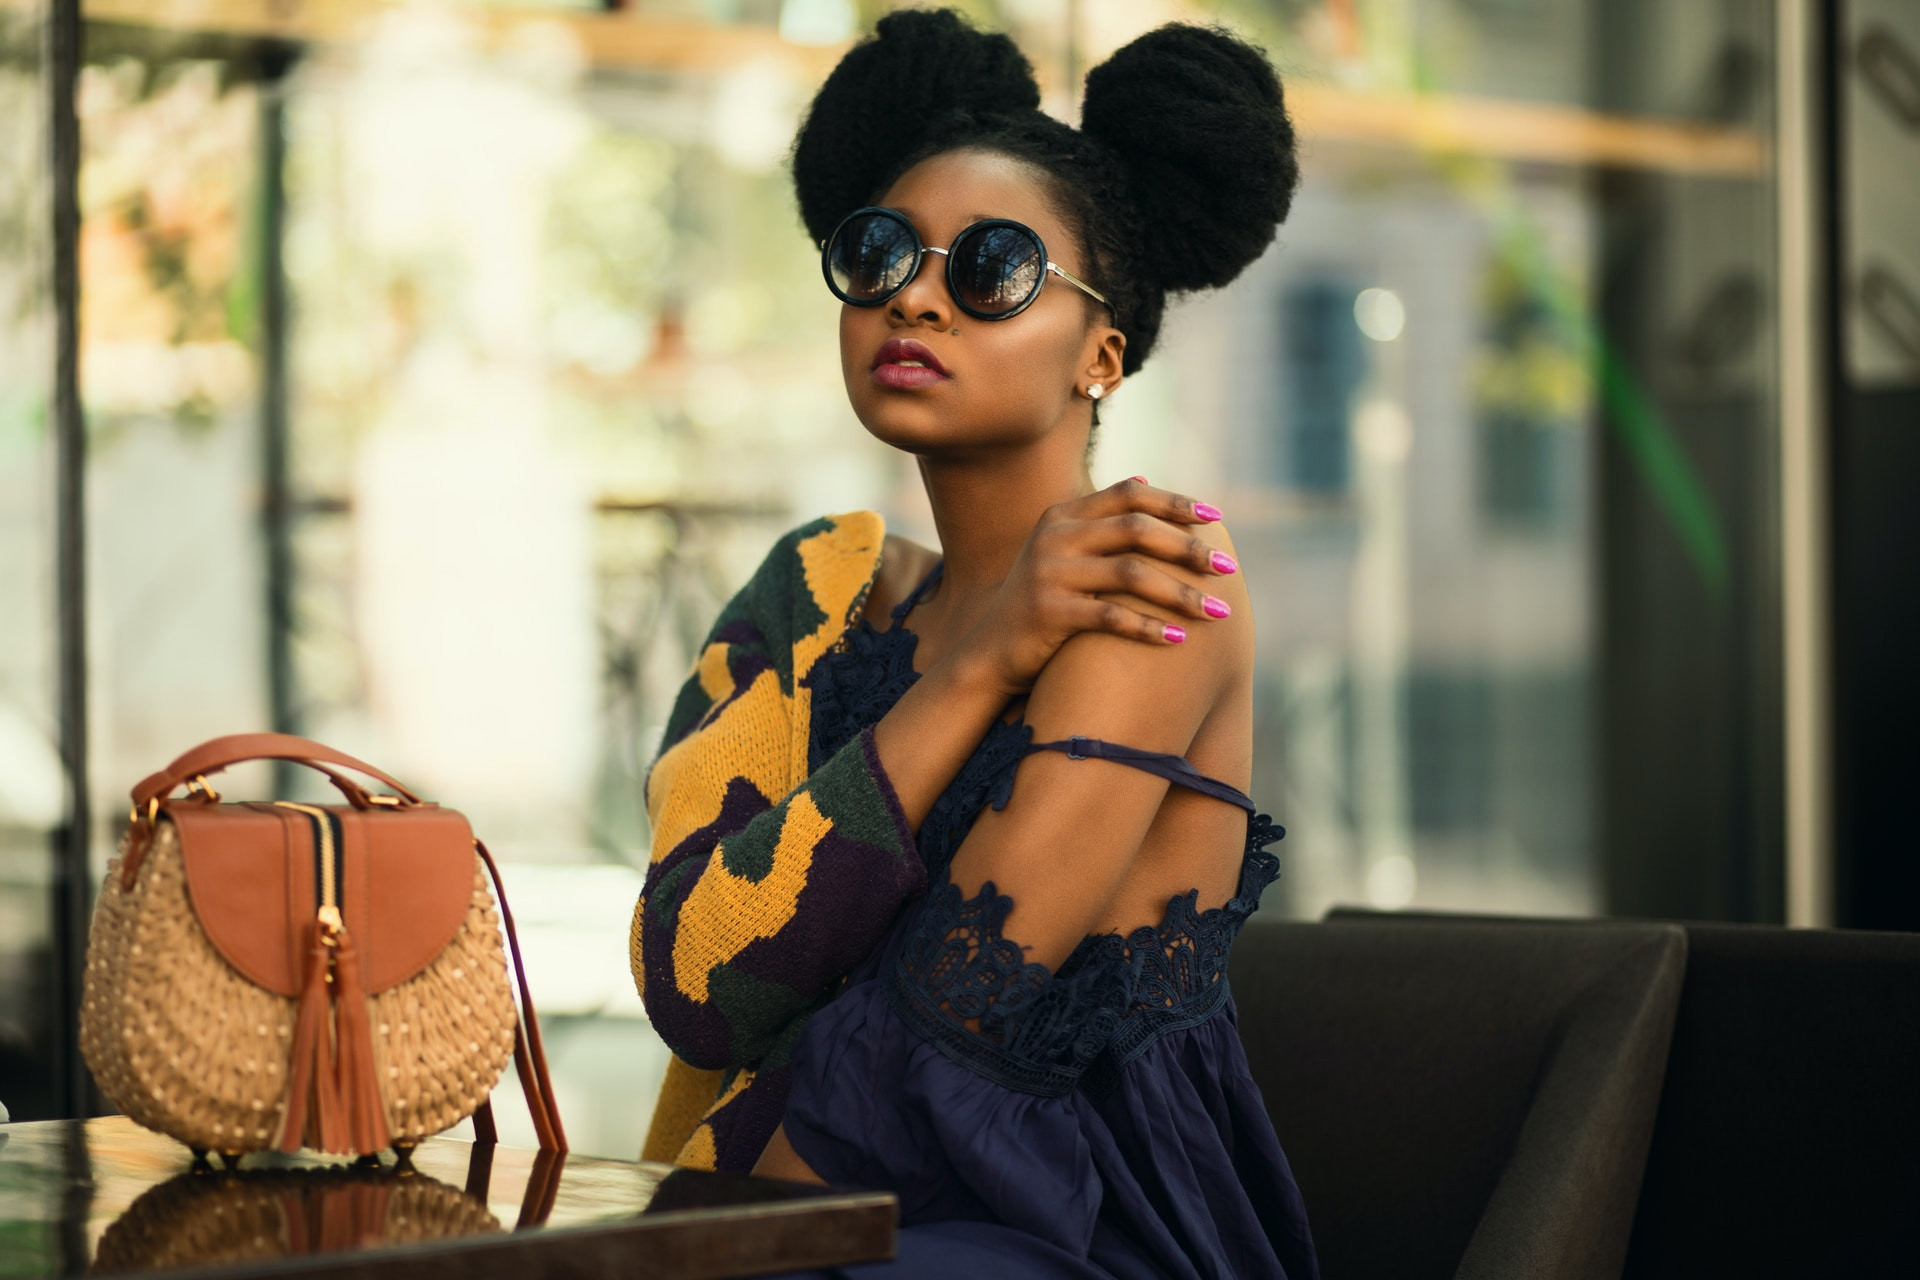 woman wearing a dress with a handbag